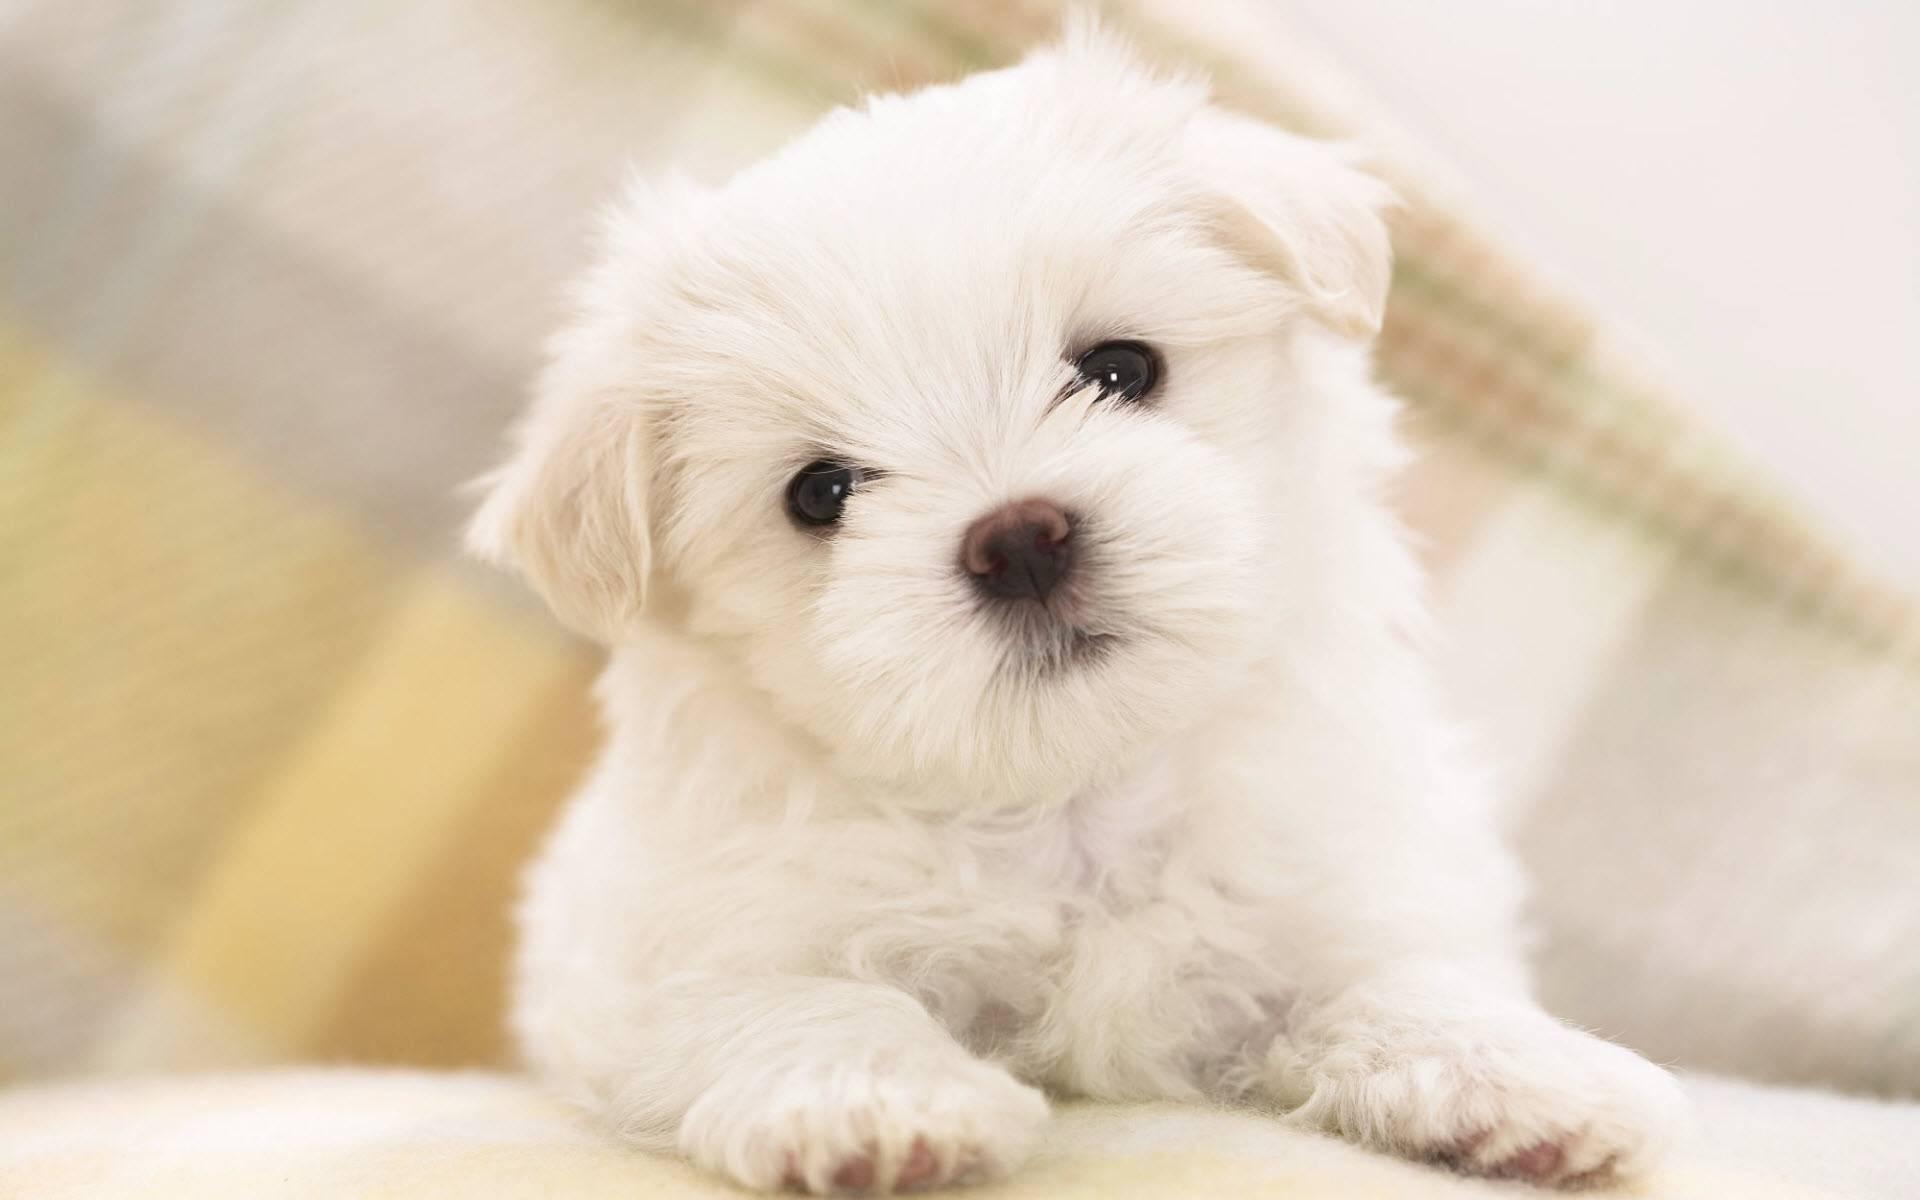 cute white puppy   Dogs Wallpaper 1920x1200